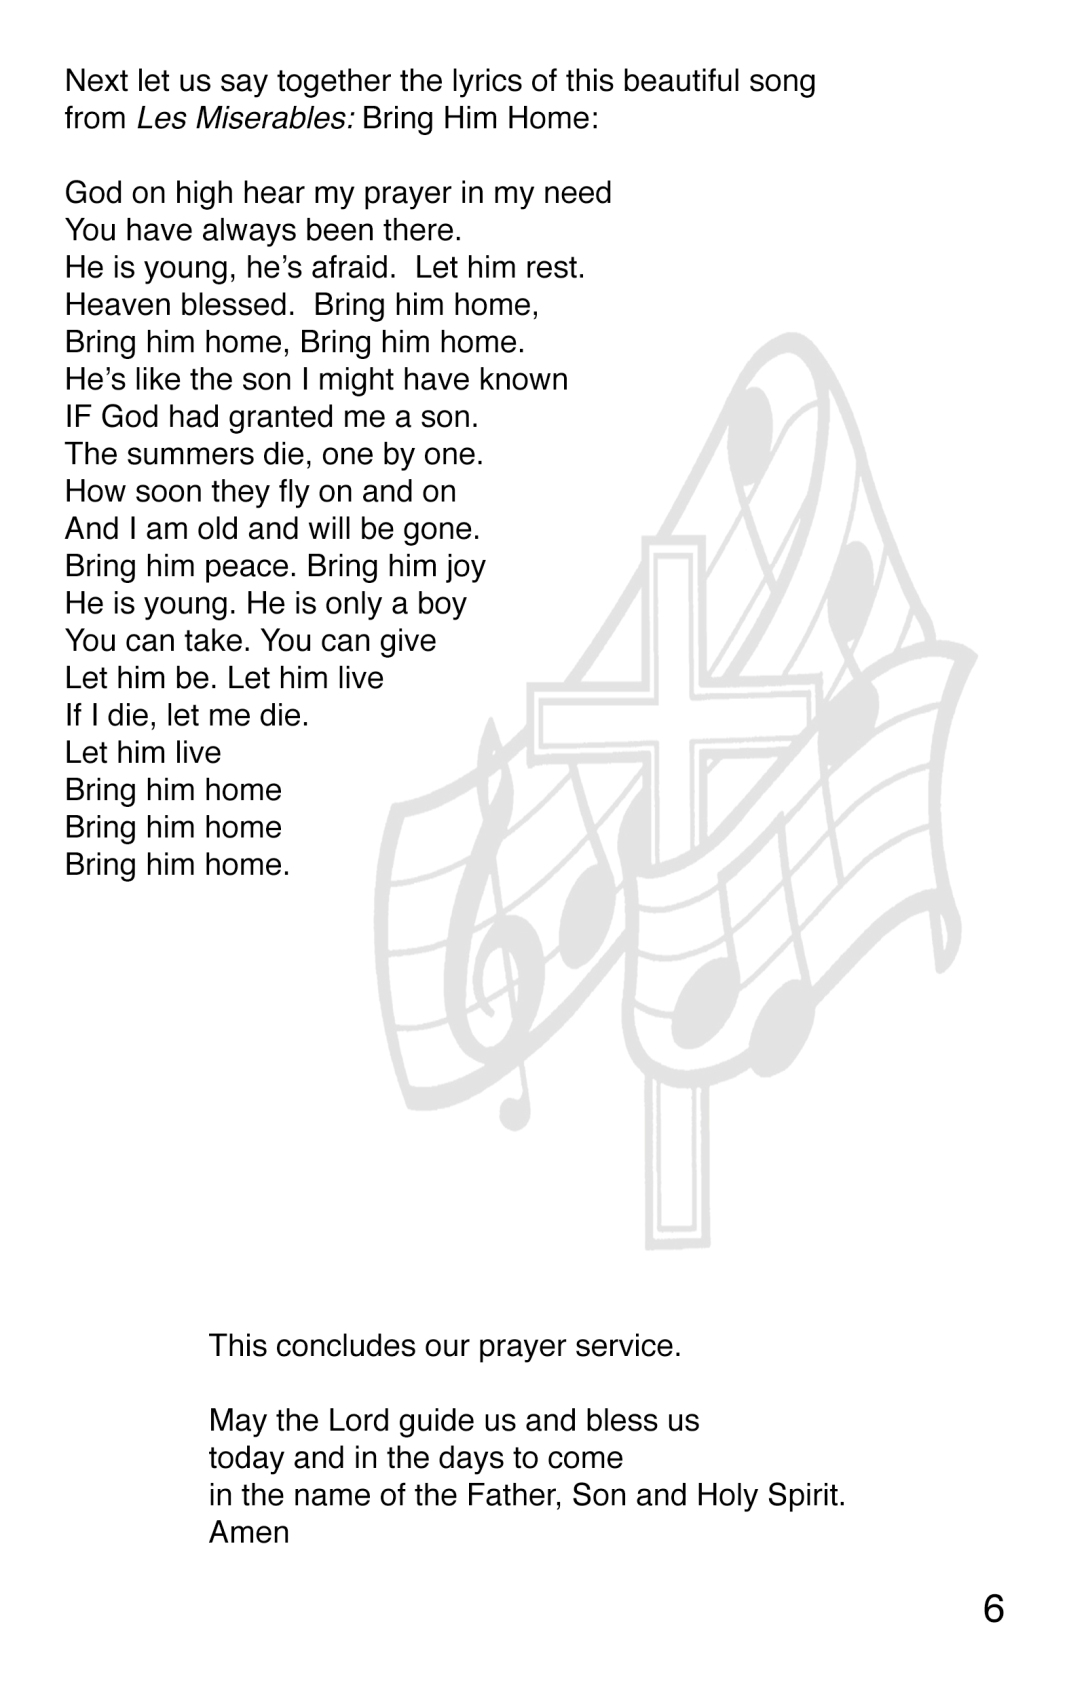 f pray